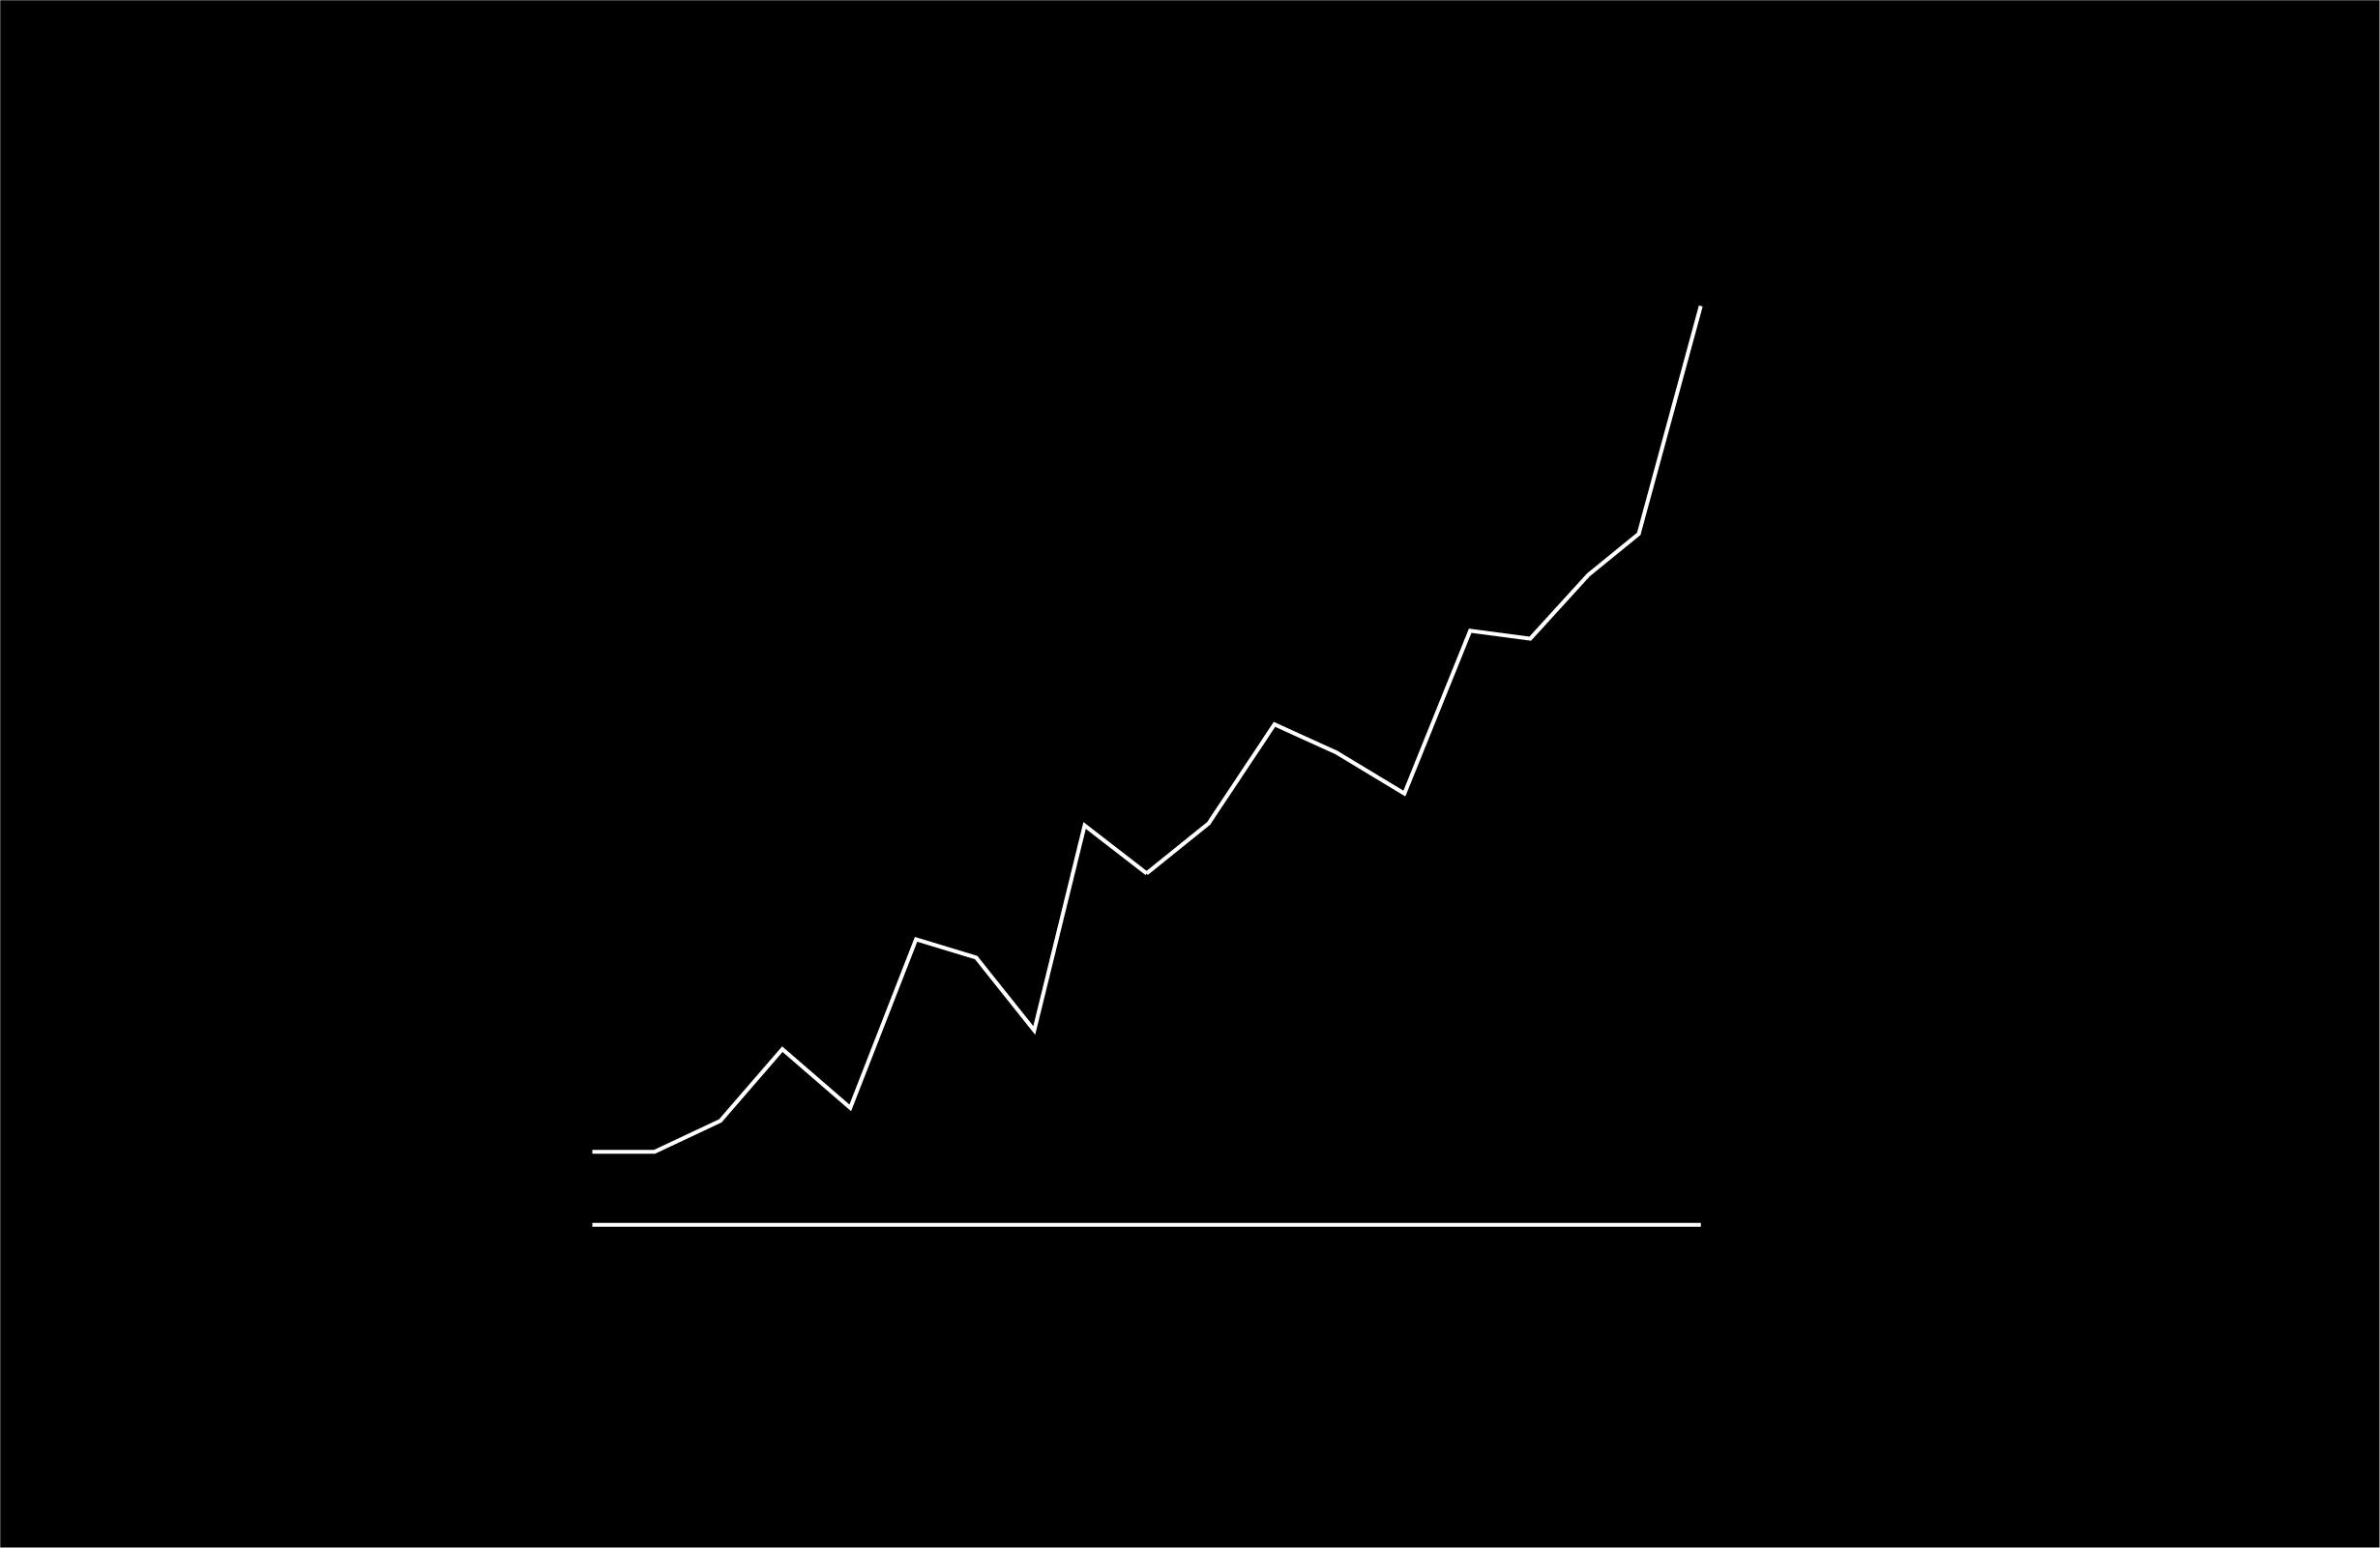 positive line graph illustration